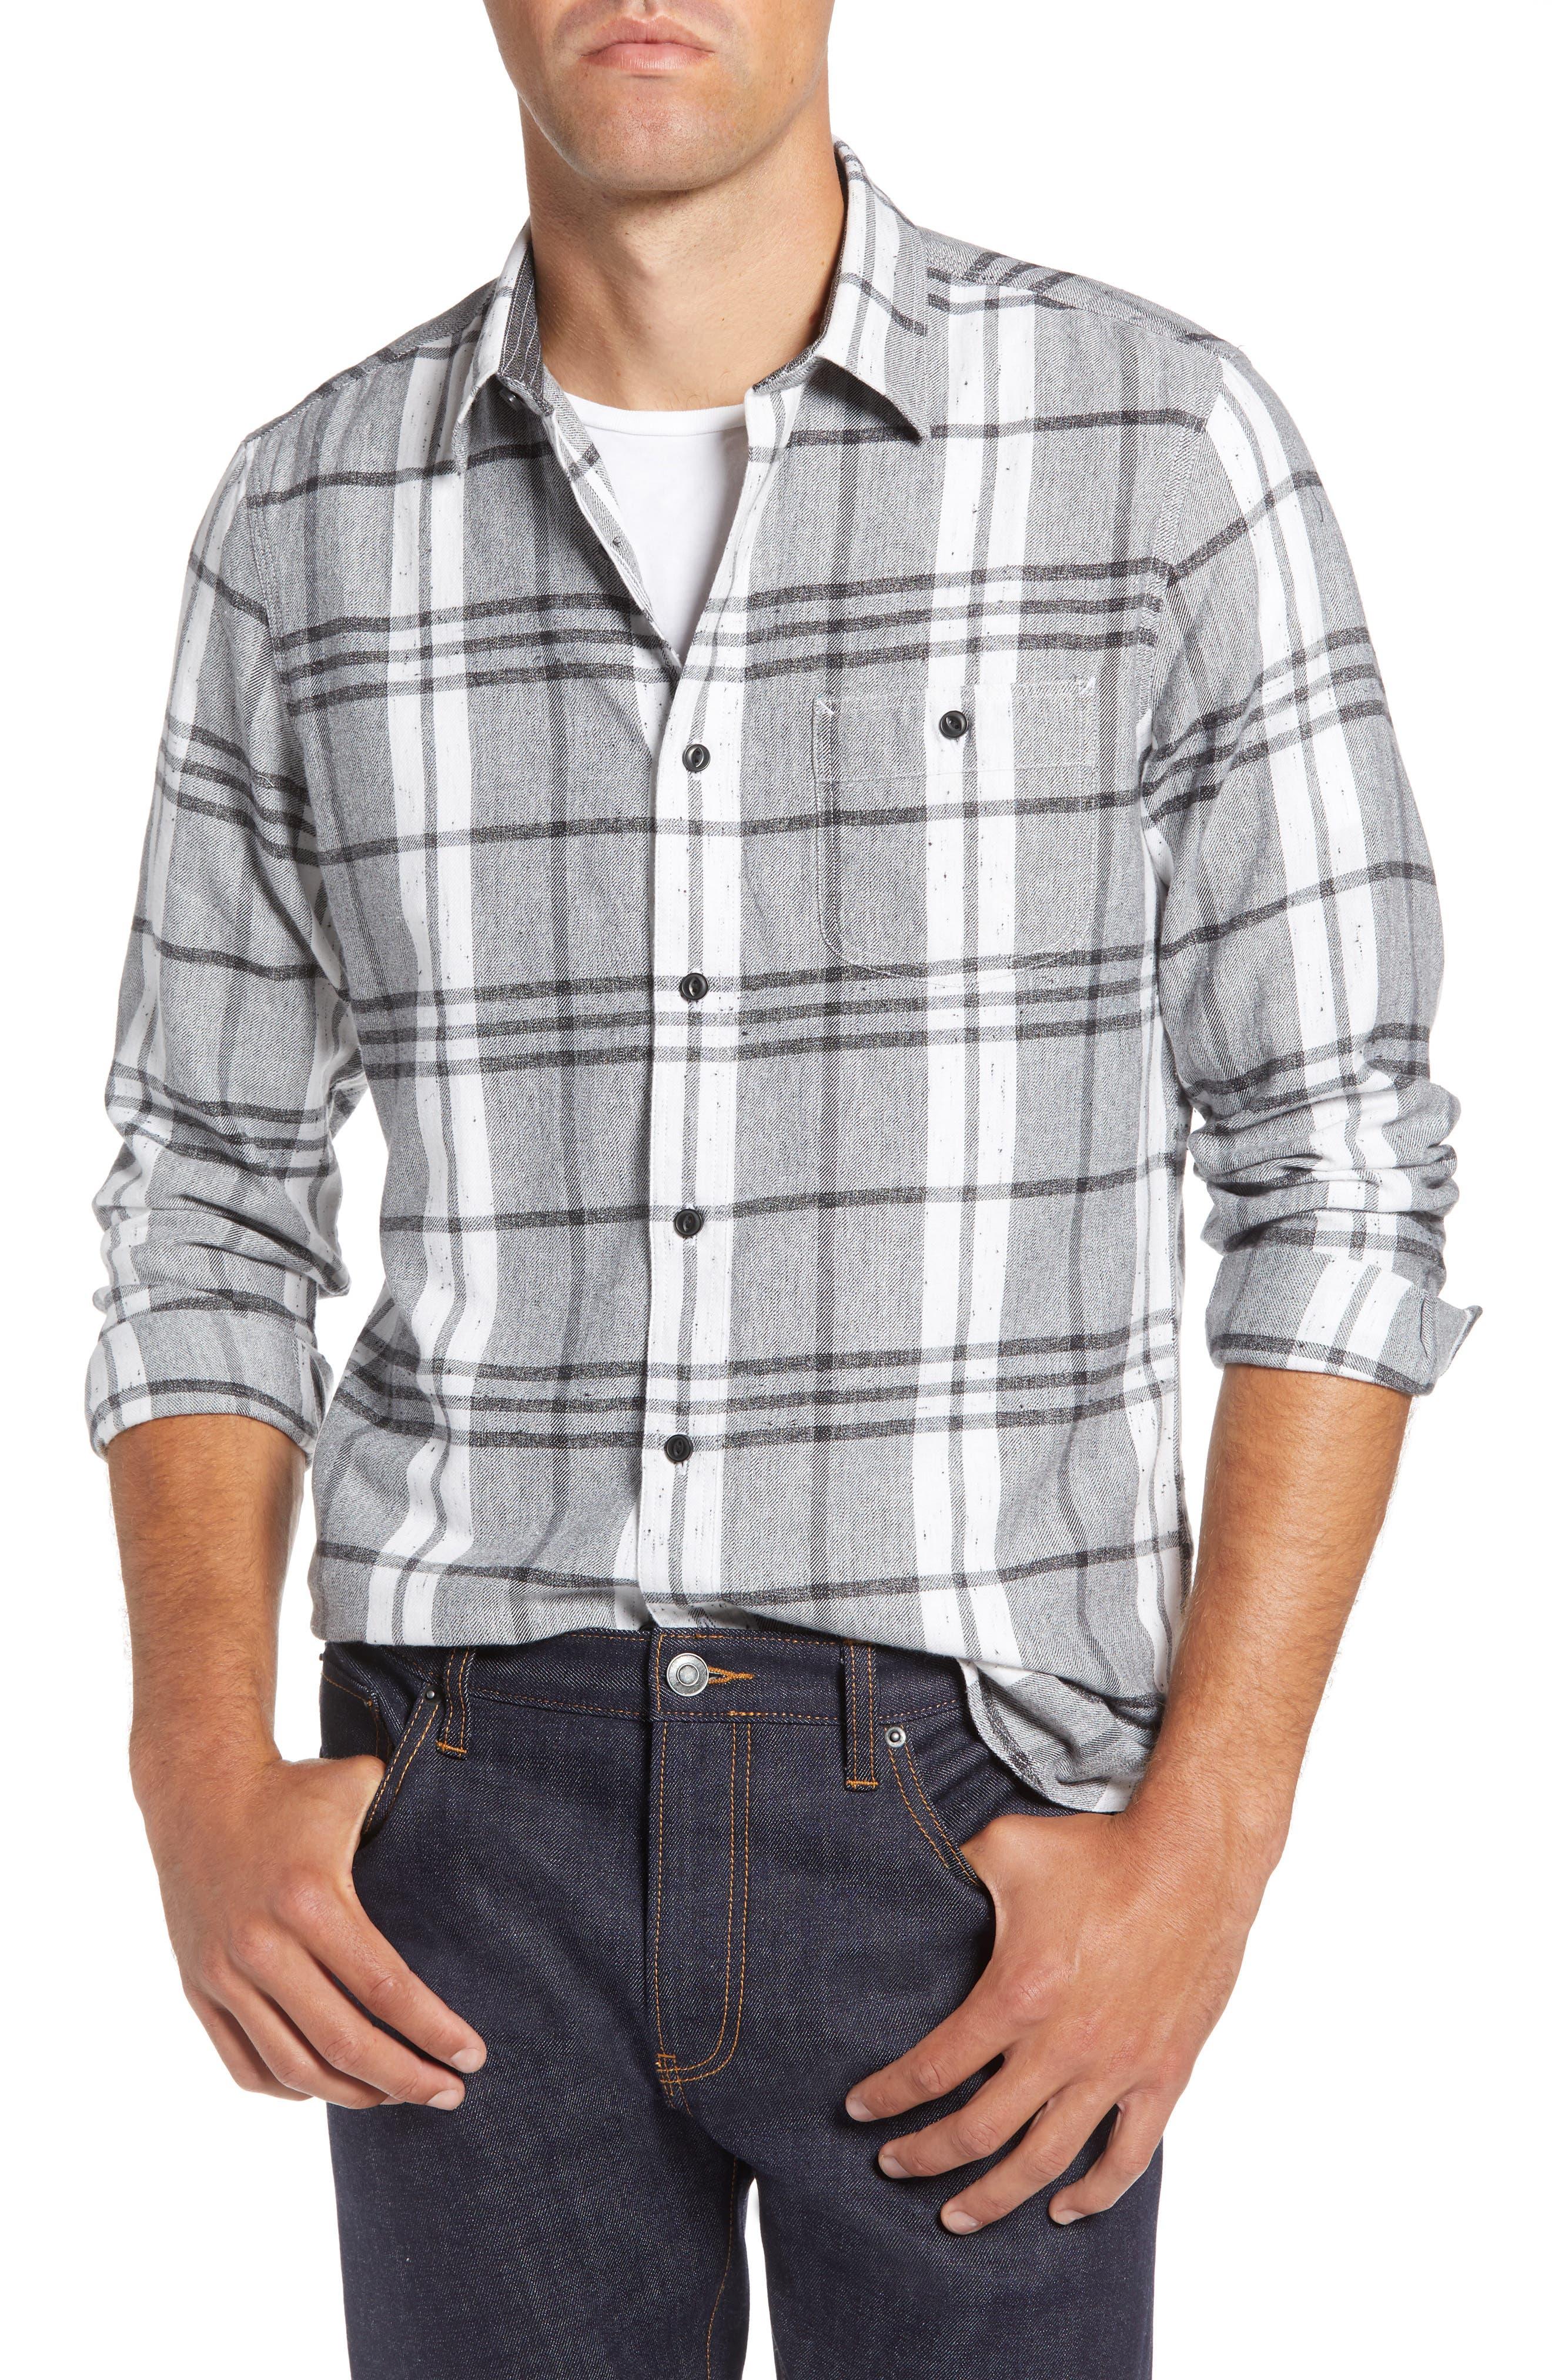 Trim Fit Brushed Plaid Utility Shirt,                         Main,                         color, GREY CASTLEROCK NEP PLAID